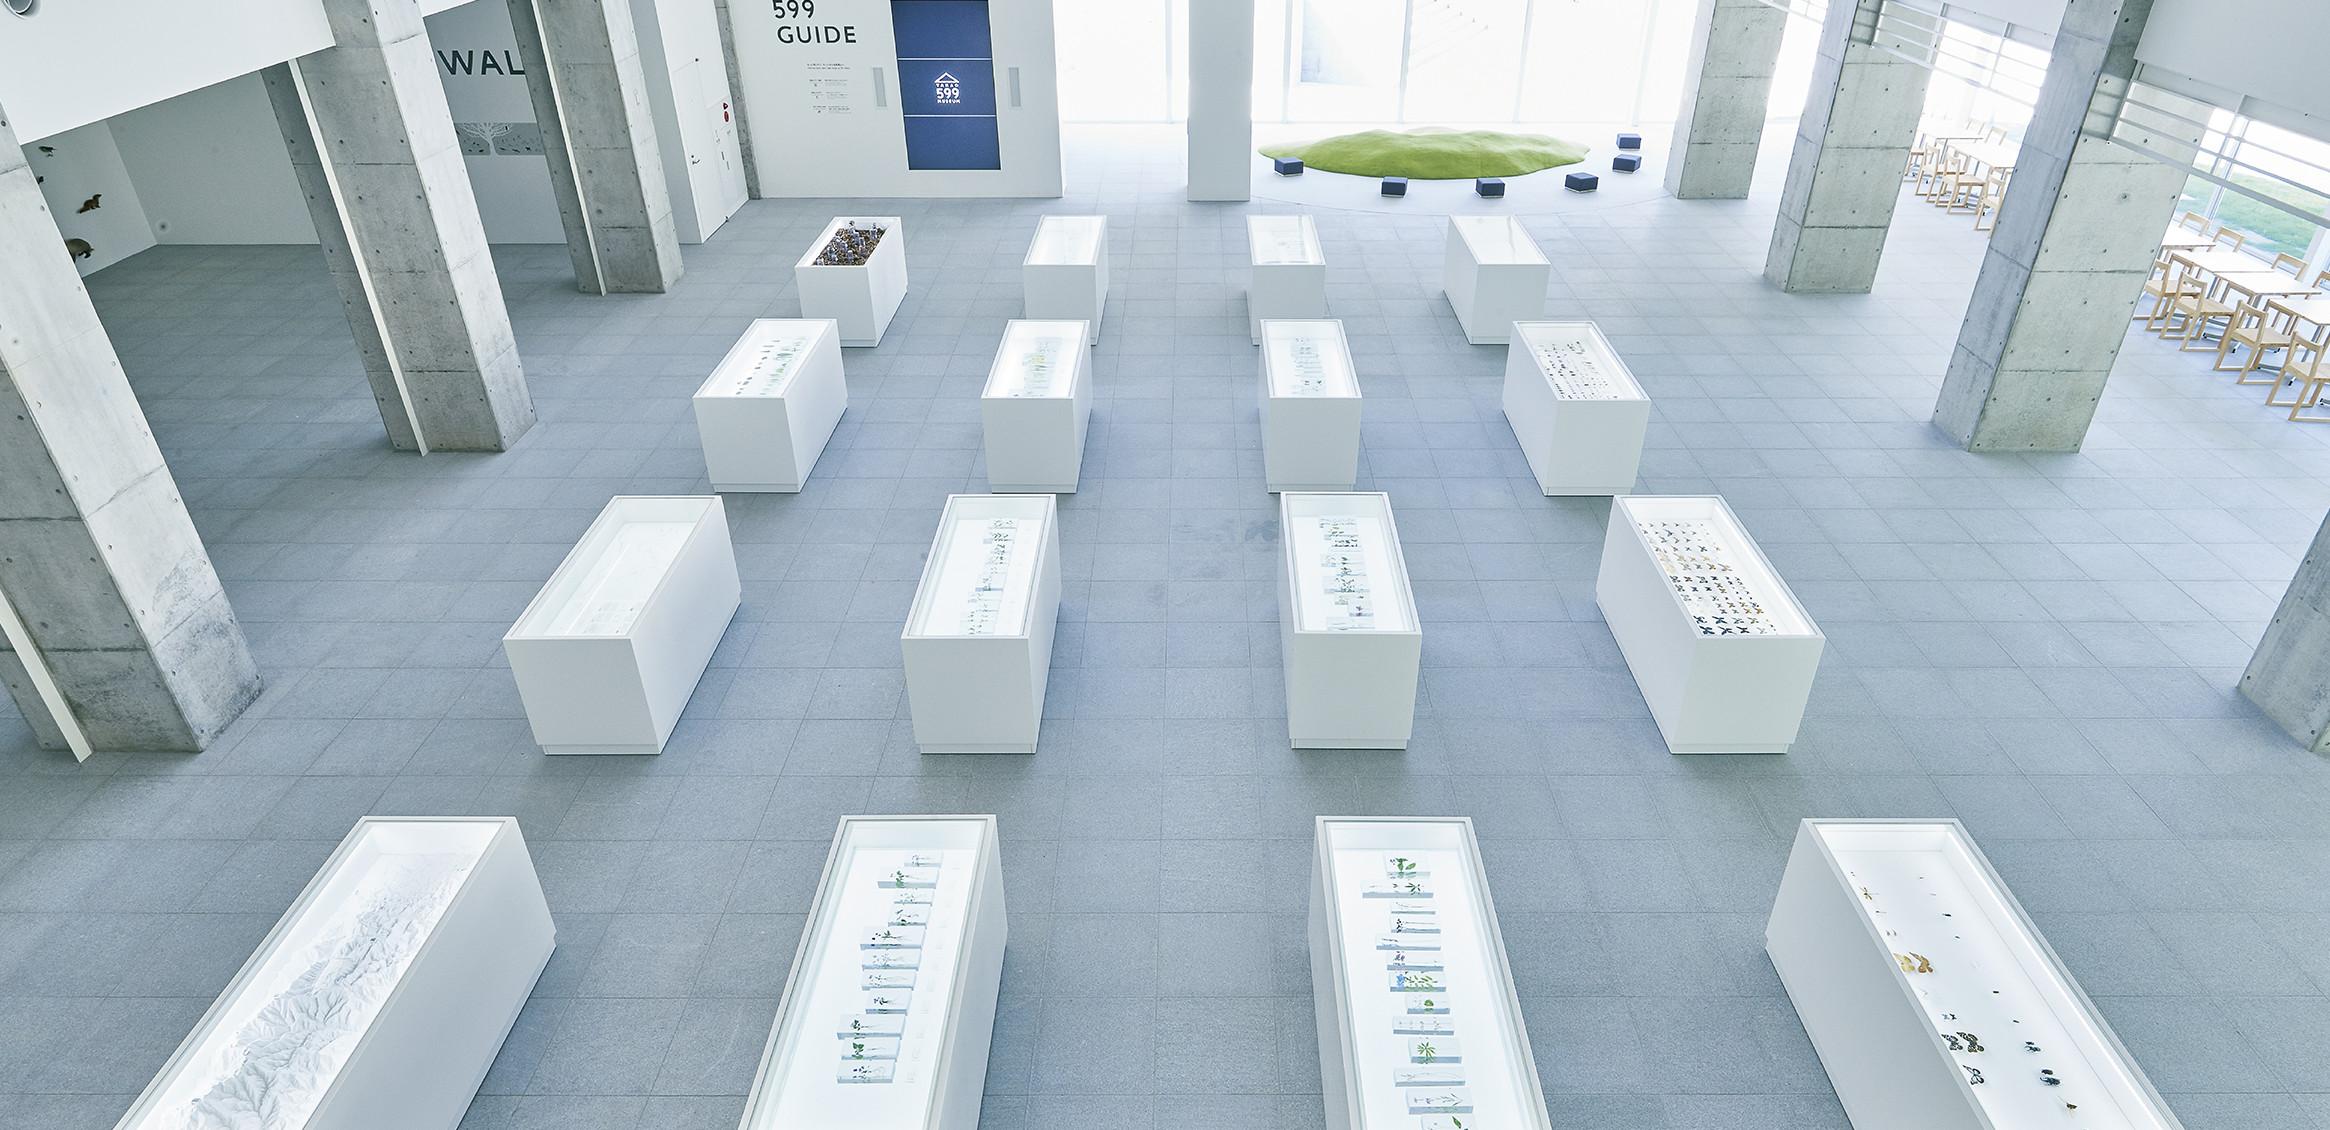 TAKAO 599 MUSEUM1枚目